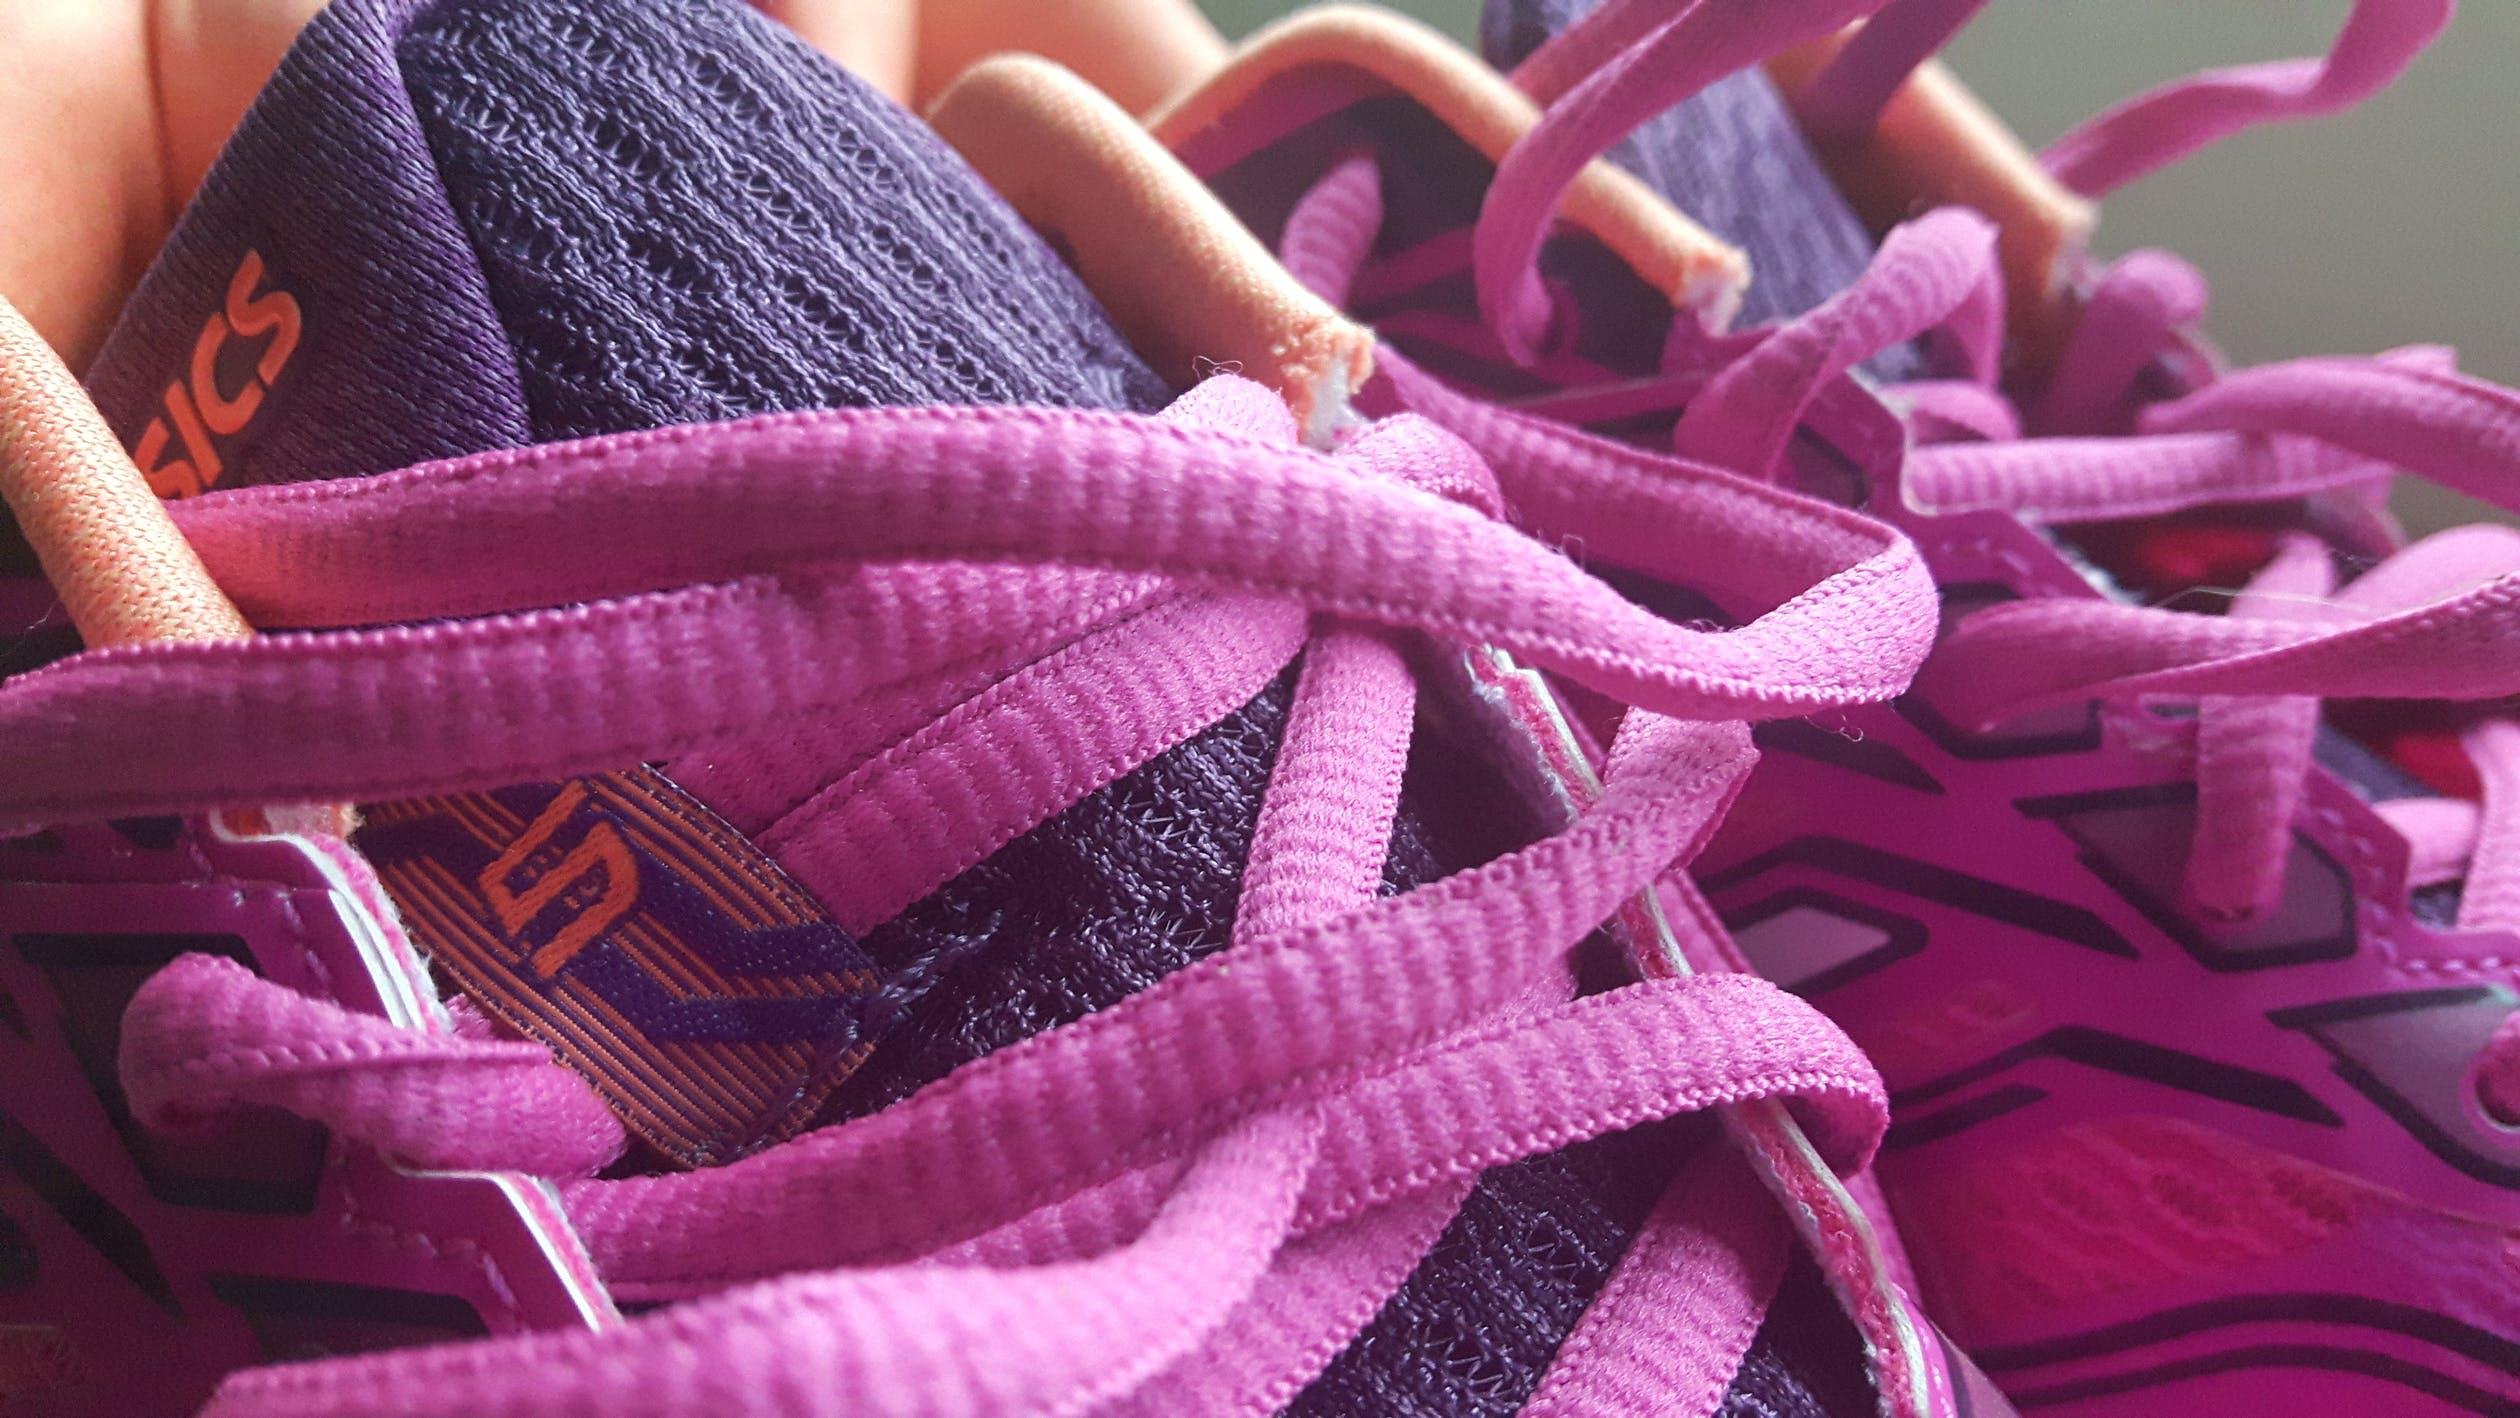 asics best shoelaces